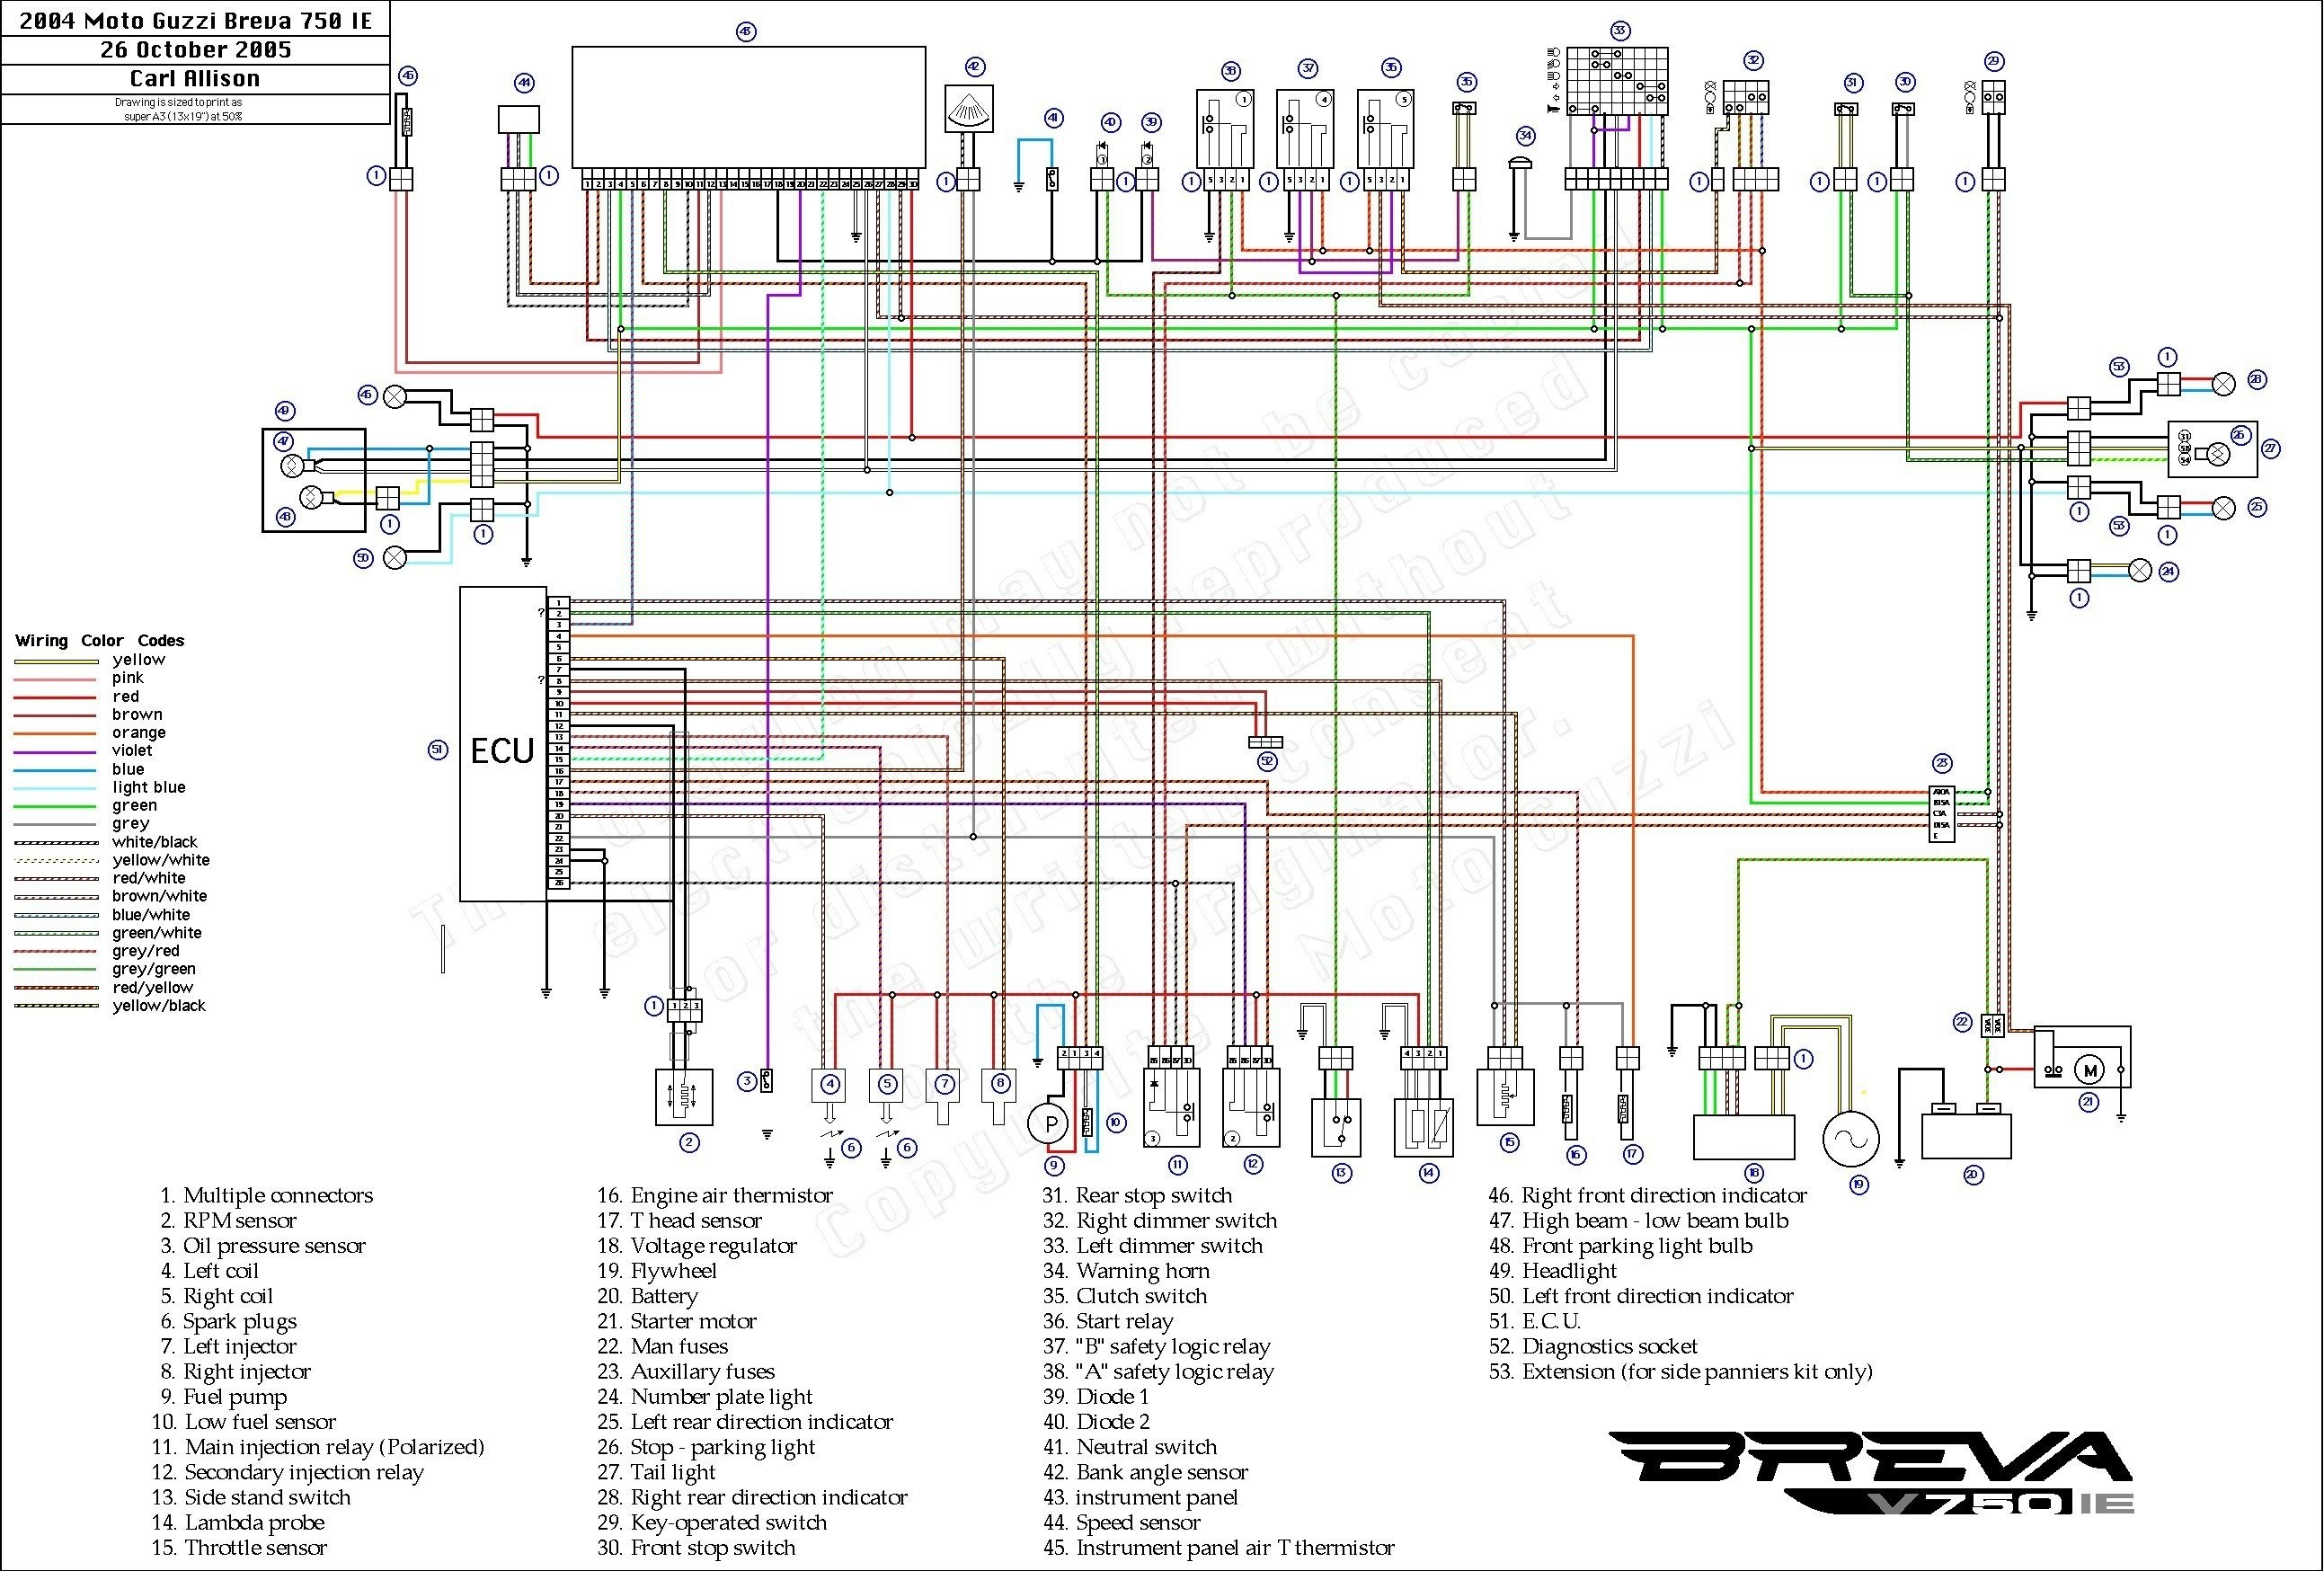 Mazda 6 Engine Parts Diagram 2001 Dodge Durango Parts Diagram Start Building A Wiring Diagram • Of Mazda 6 Engine Parts Diagram